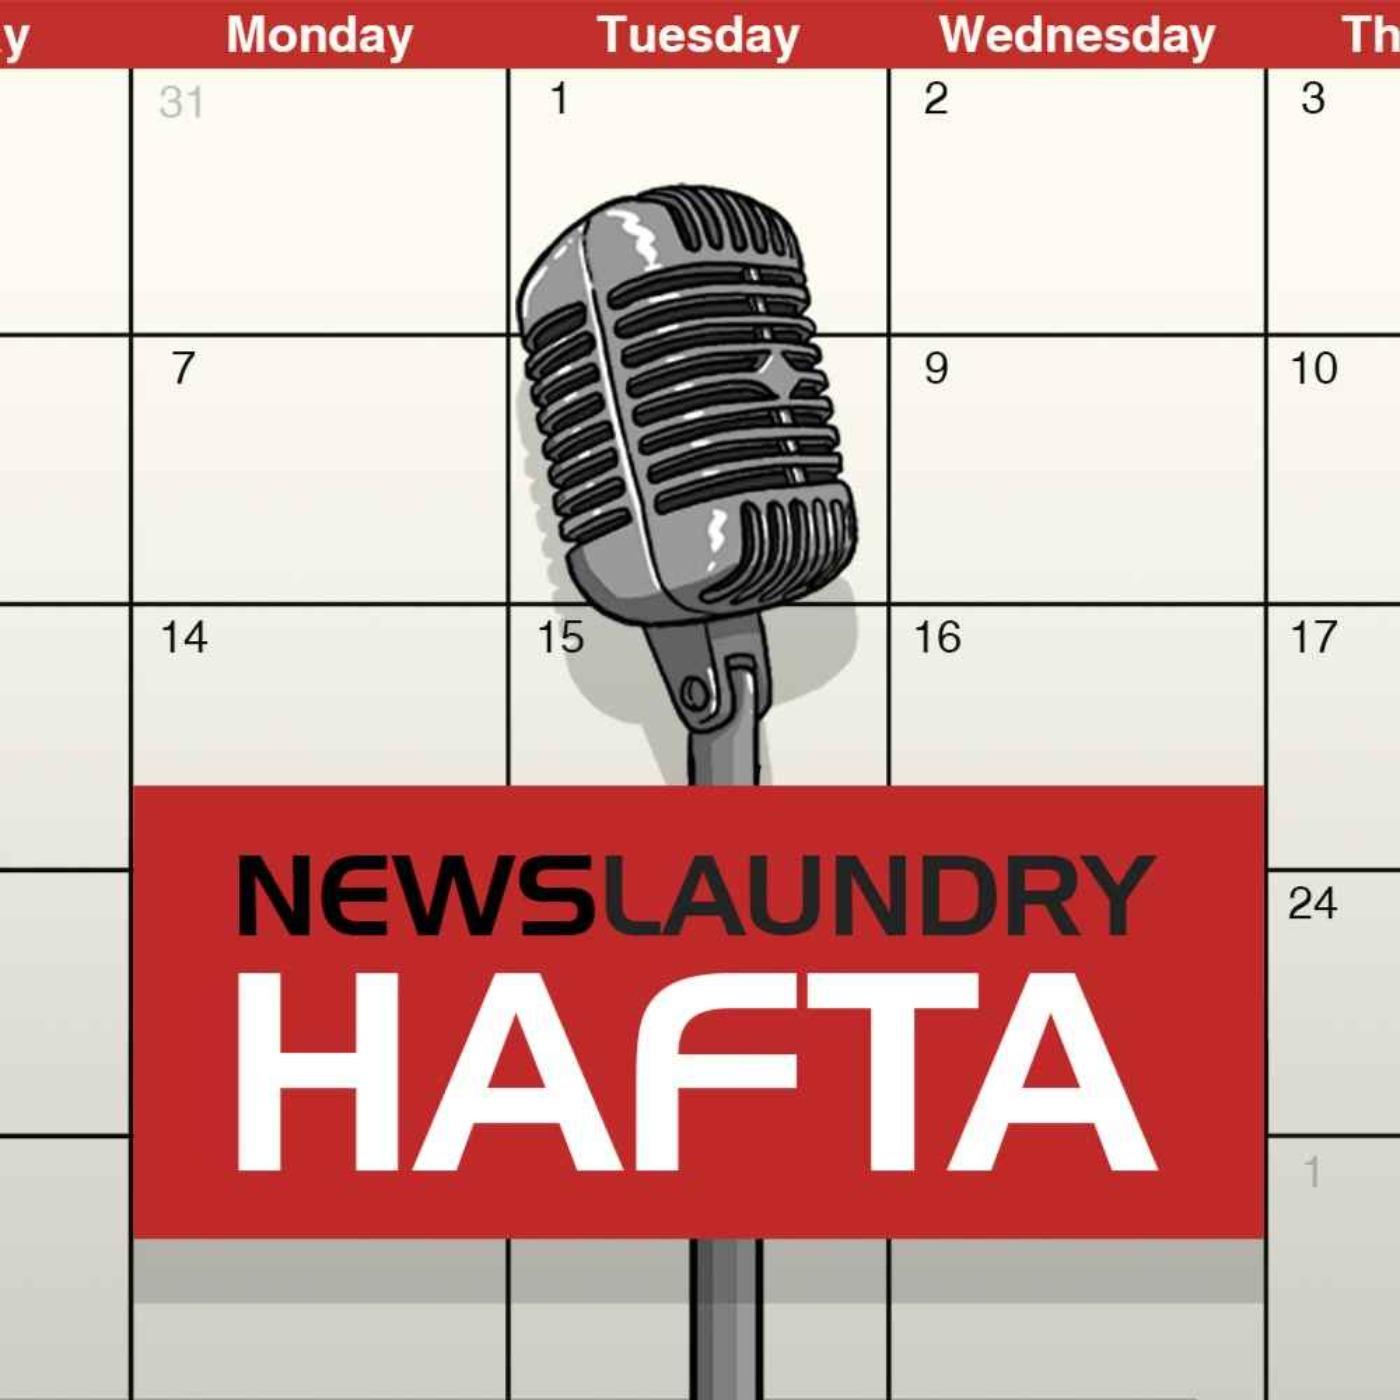 Chhota Hafta 314: Budget 2021, Rihanna and Greta Thunberg's tweets, and journalists detained at Singhu